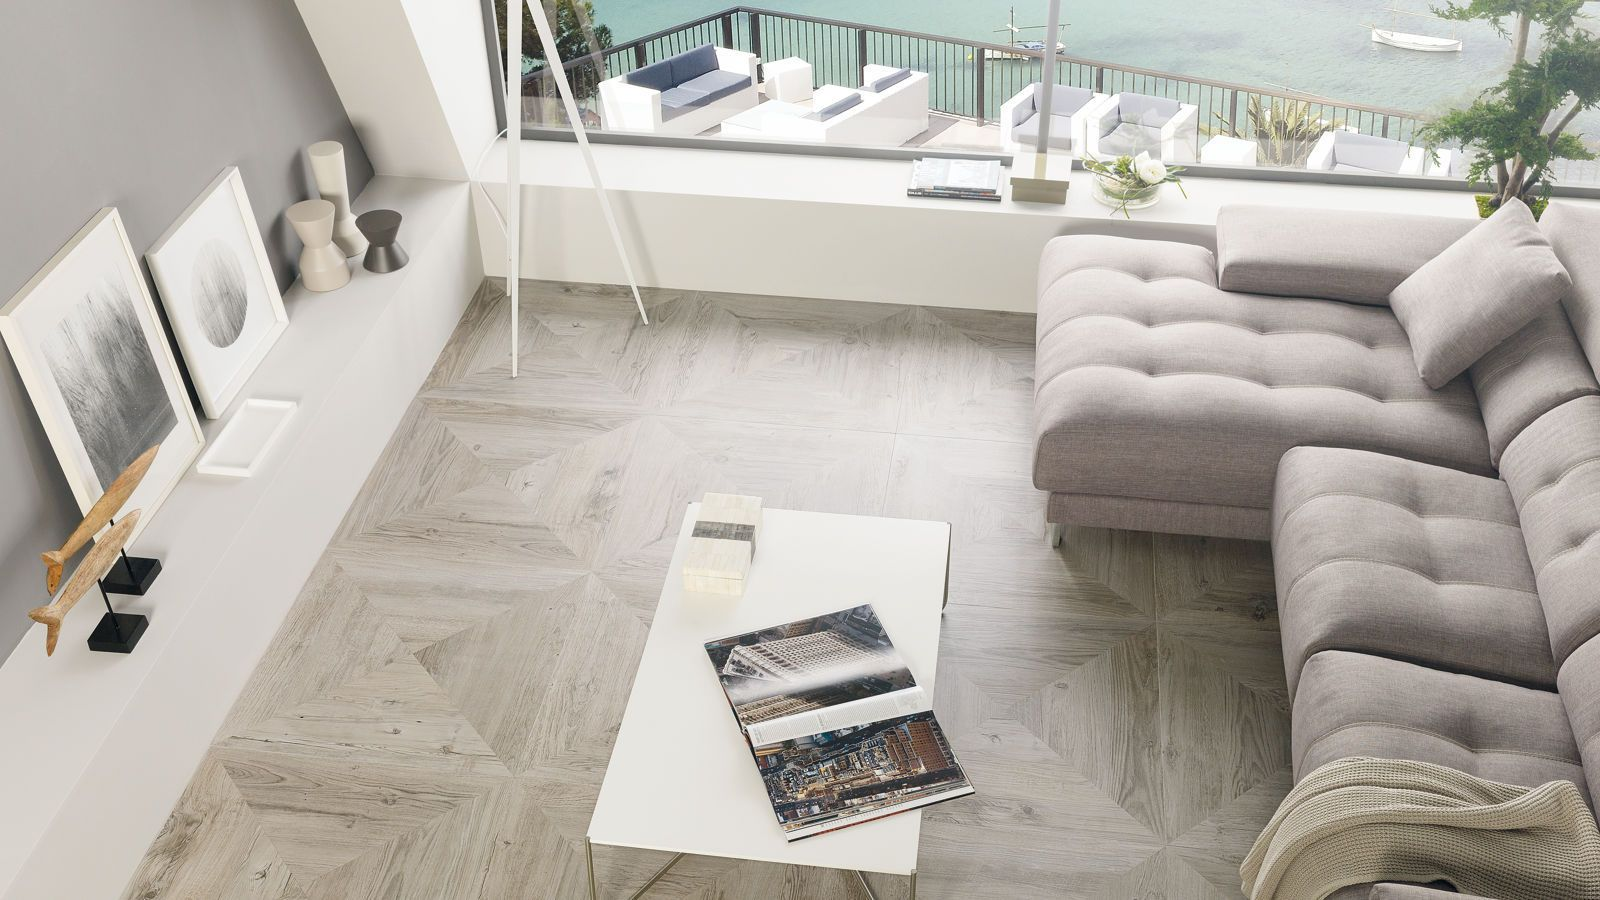 Par Ker Floor Tiles Heritage Natural 80x80 Cm Wood Tile Floors Style Tile Wood Look Tile